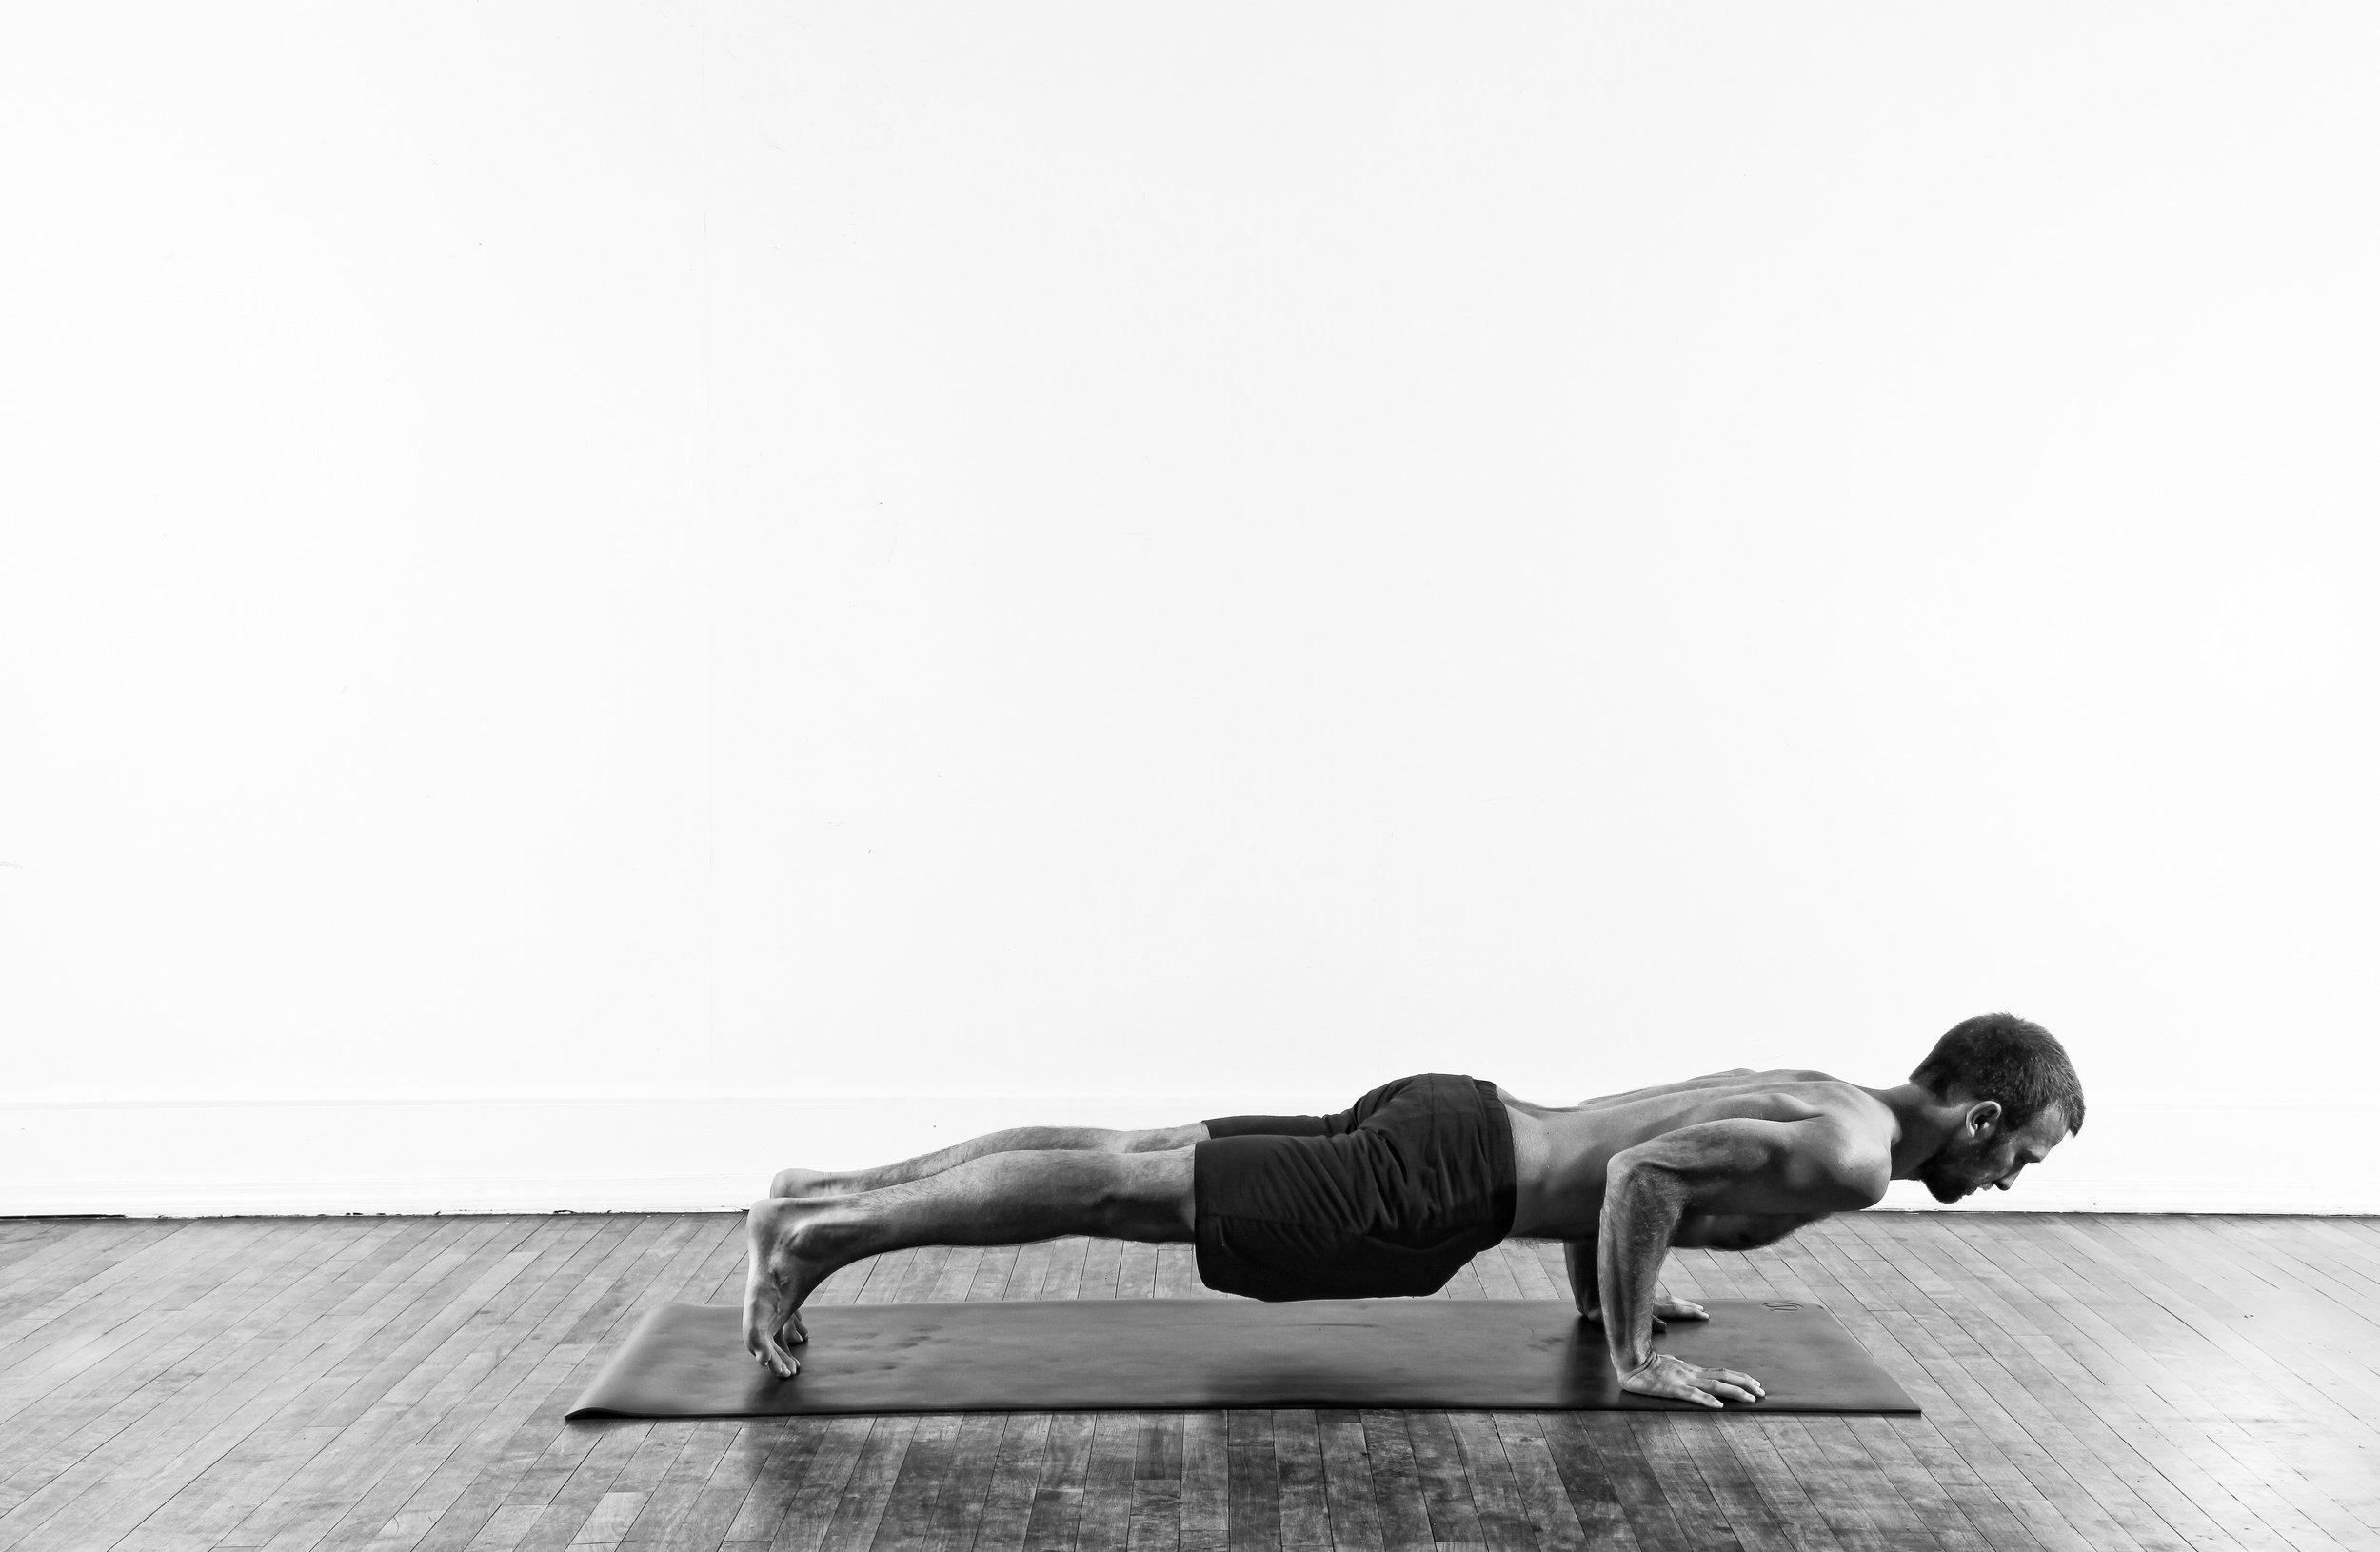 Yoga Push-up / Chaturanga Dandasana